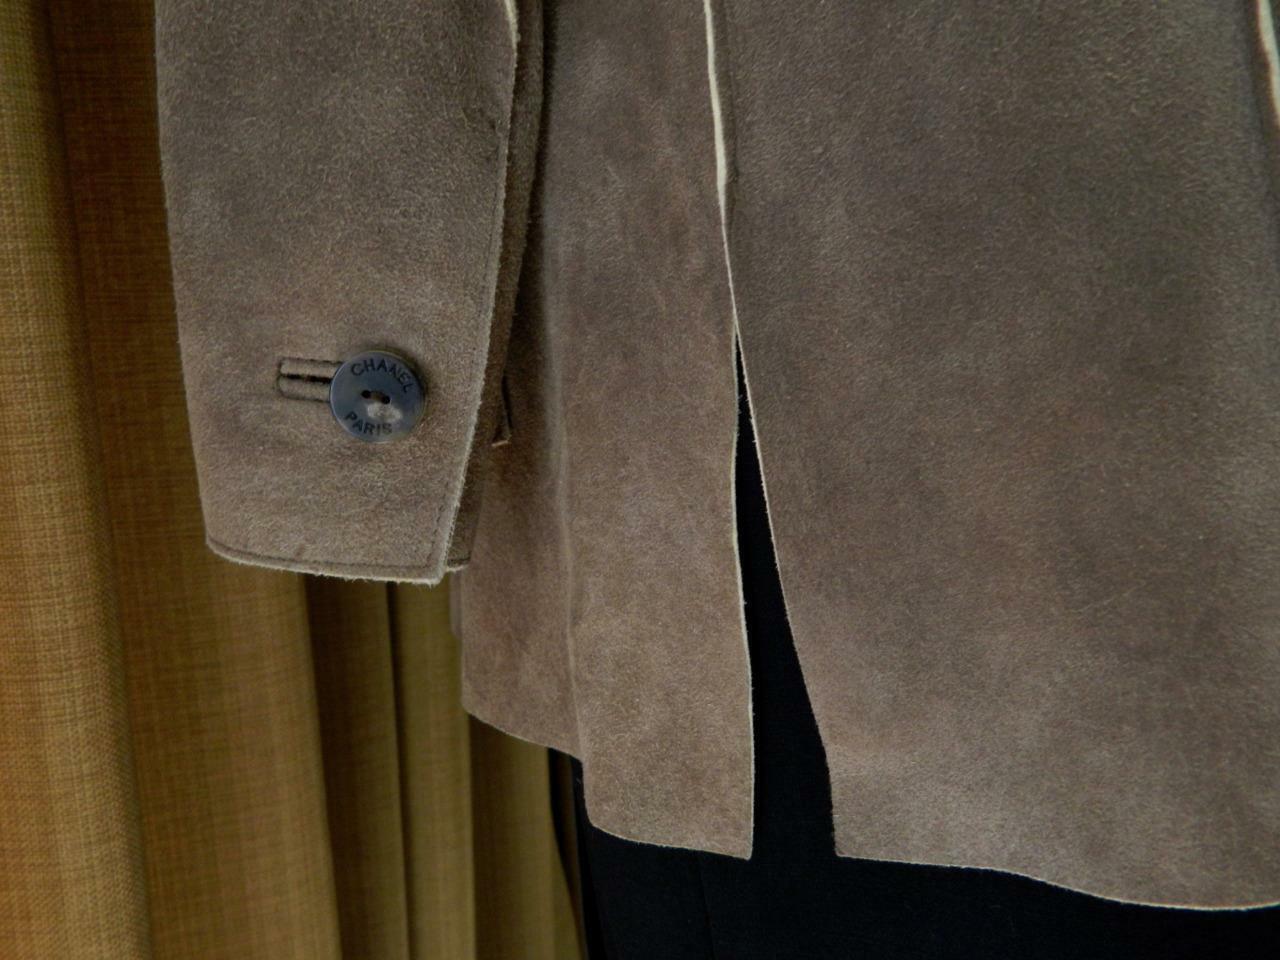 CHANEL Jacket Deer Skin Suede Chanel Horn Button … - image 7